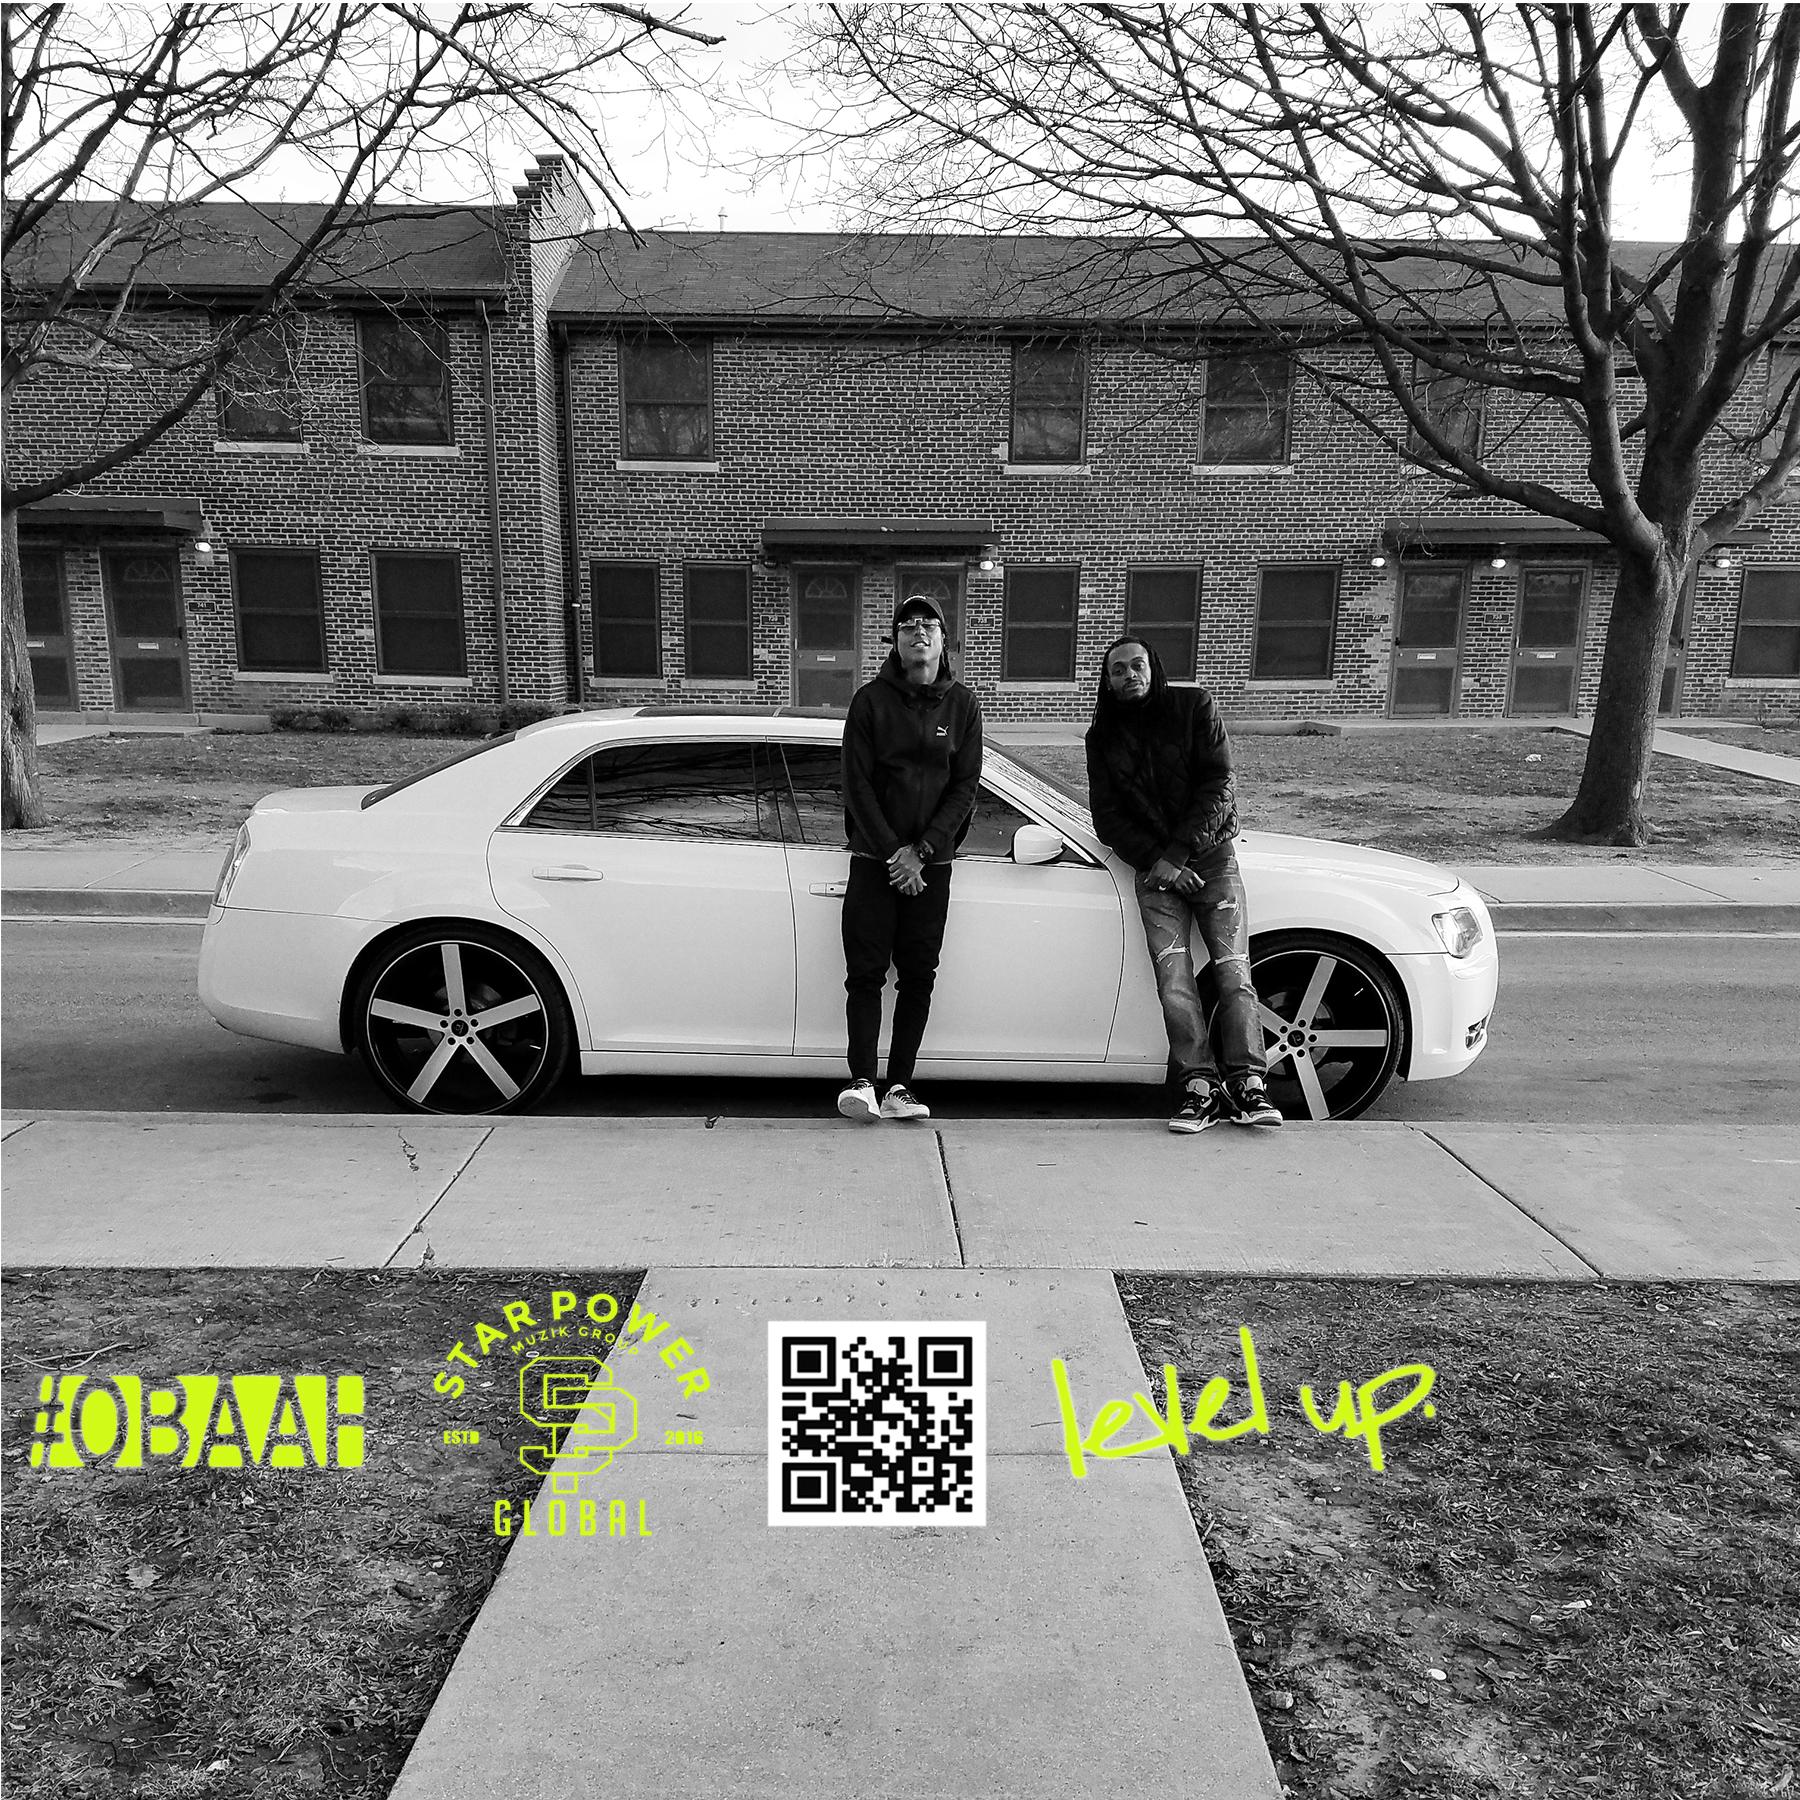 obaah+starpower-promo.jpg